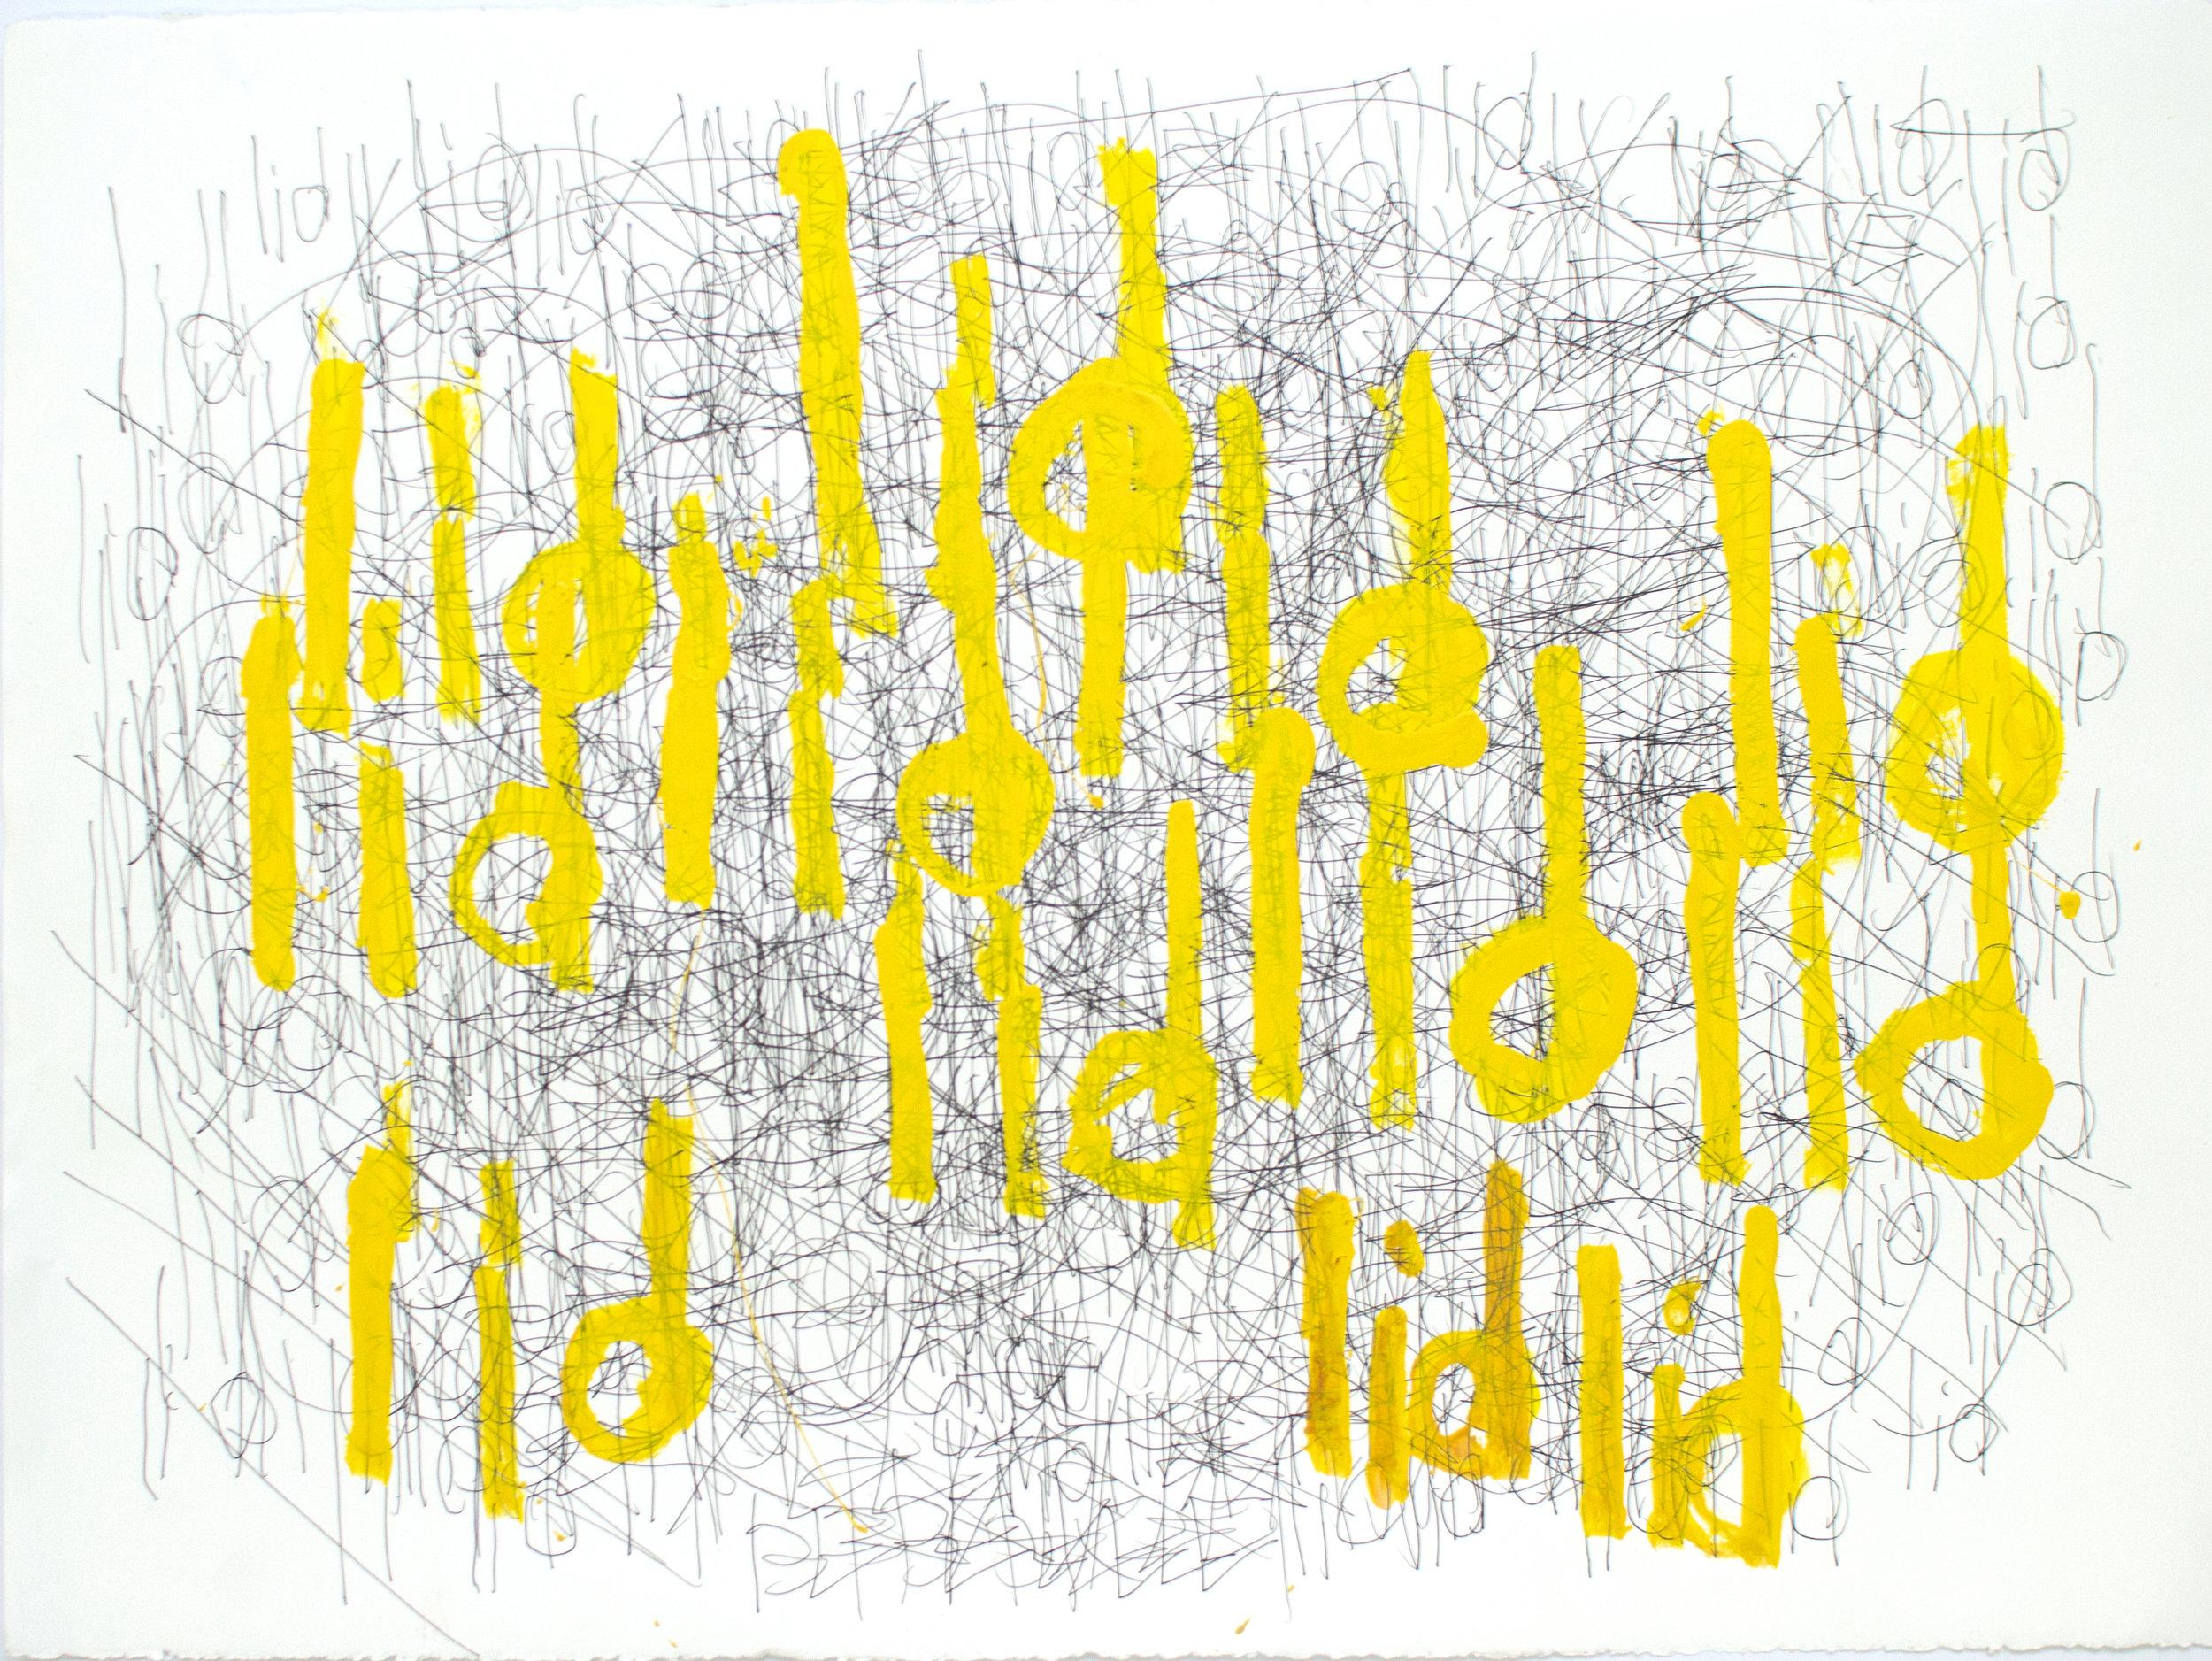 Dan Miller, Untitled (DM 897), 2017, 22.25 x 30 inches